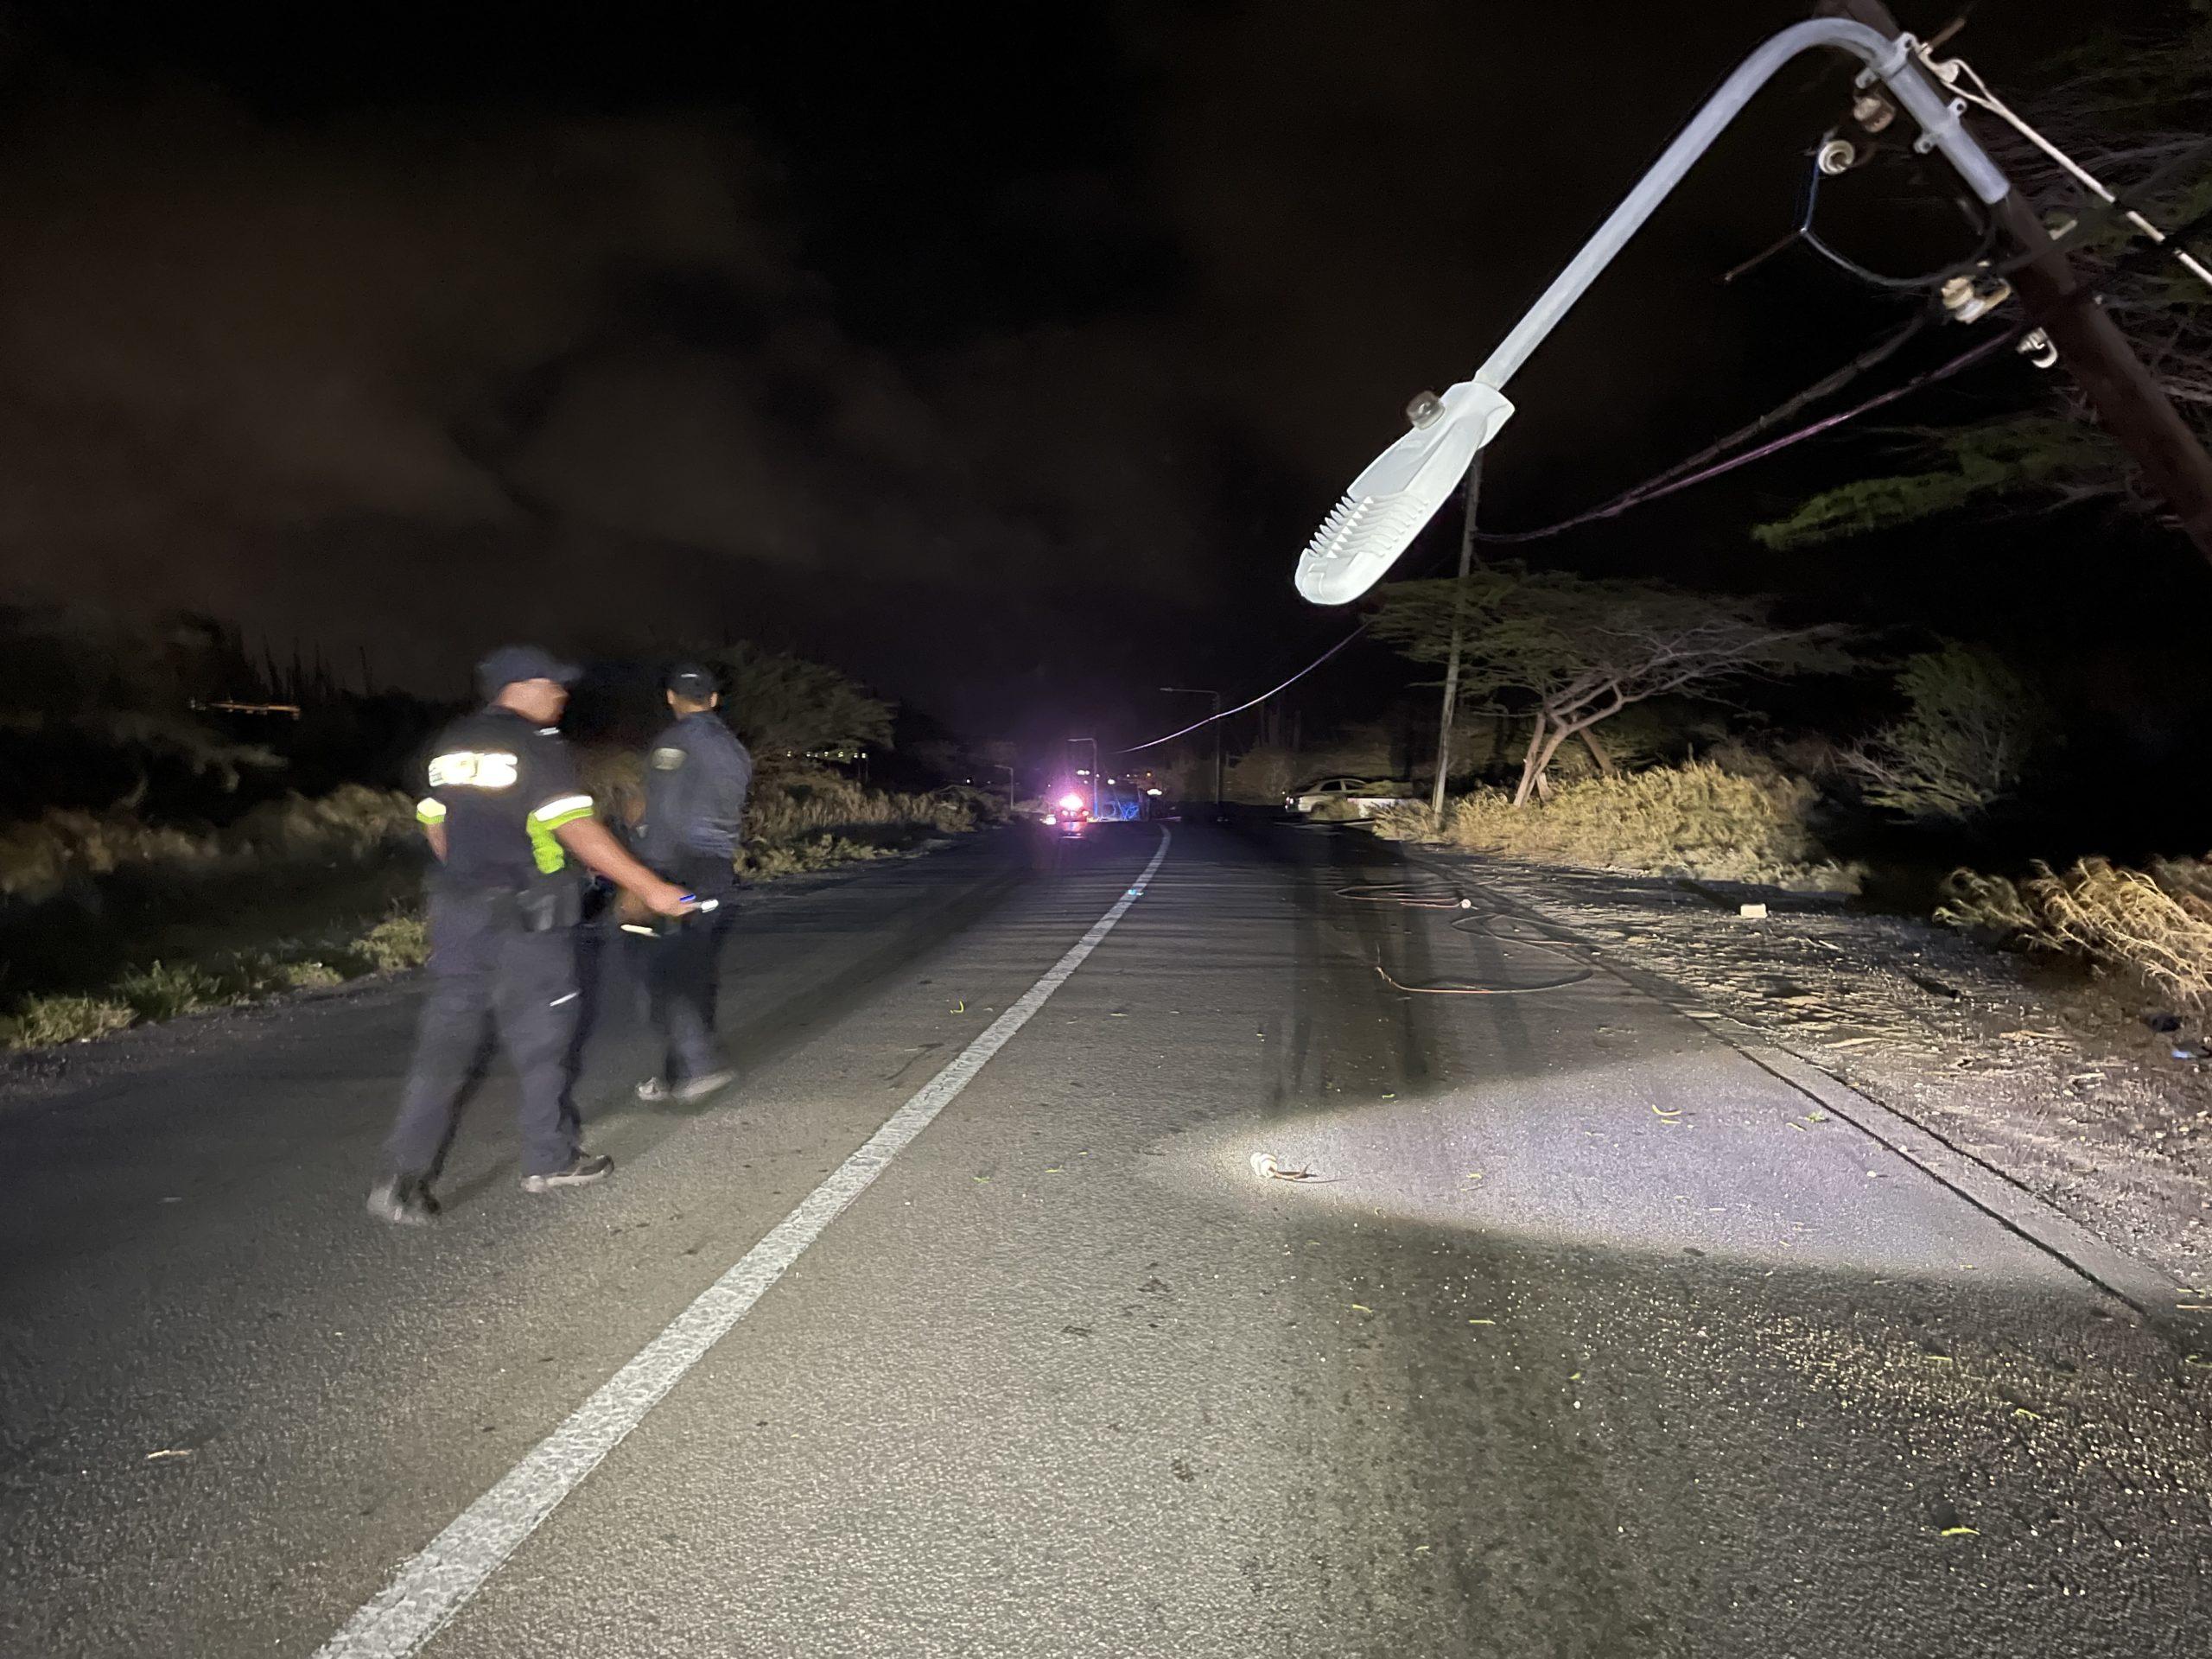 Chauffeur a bandona sitio despues di accidenta